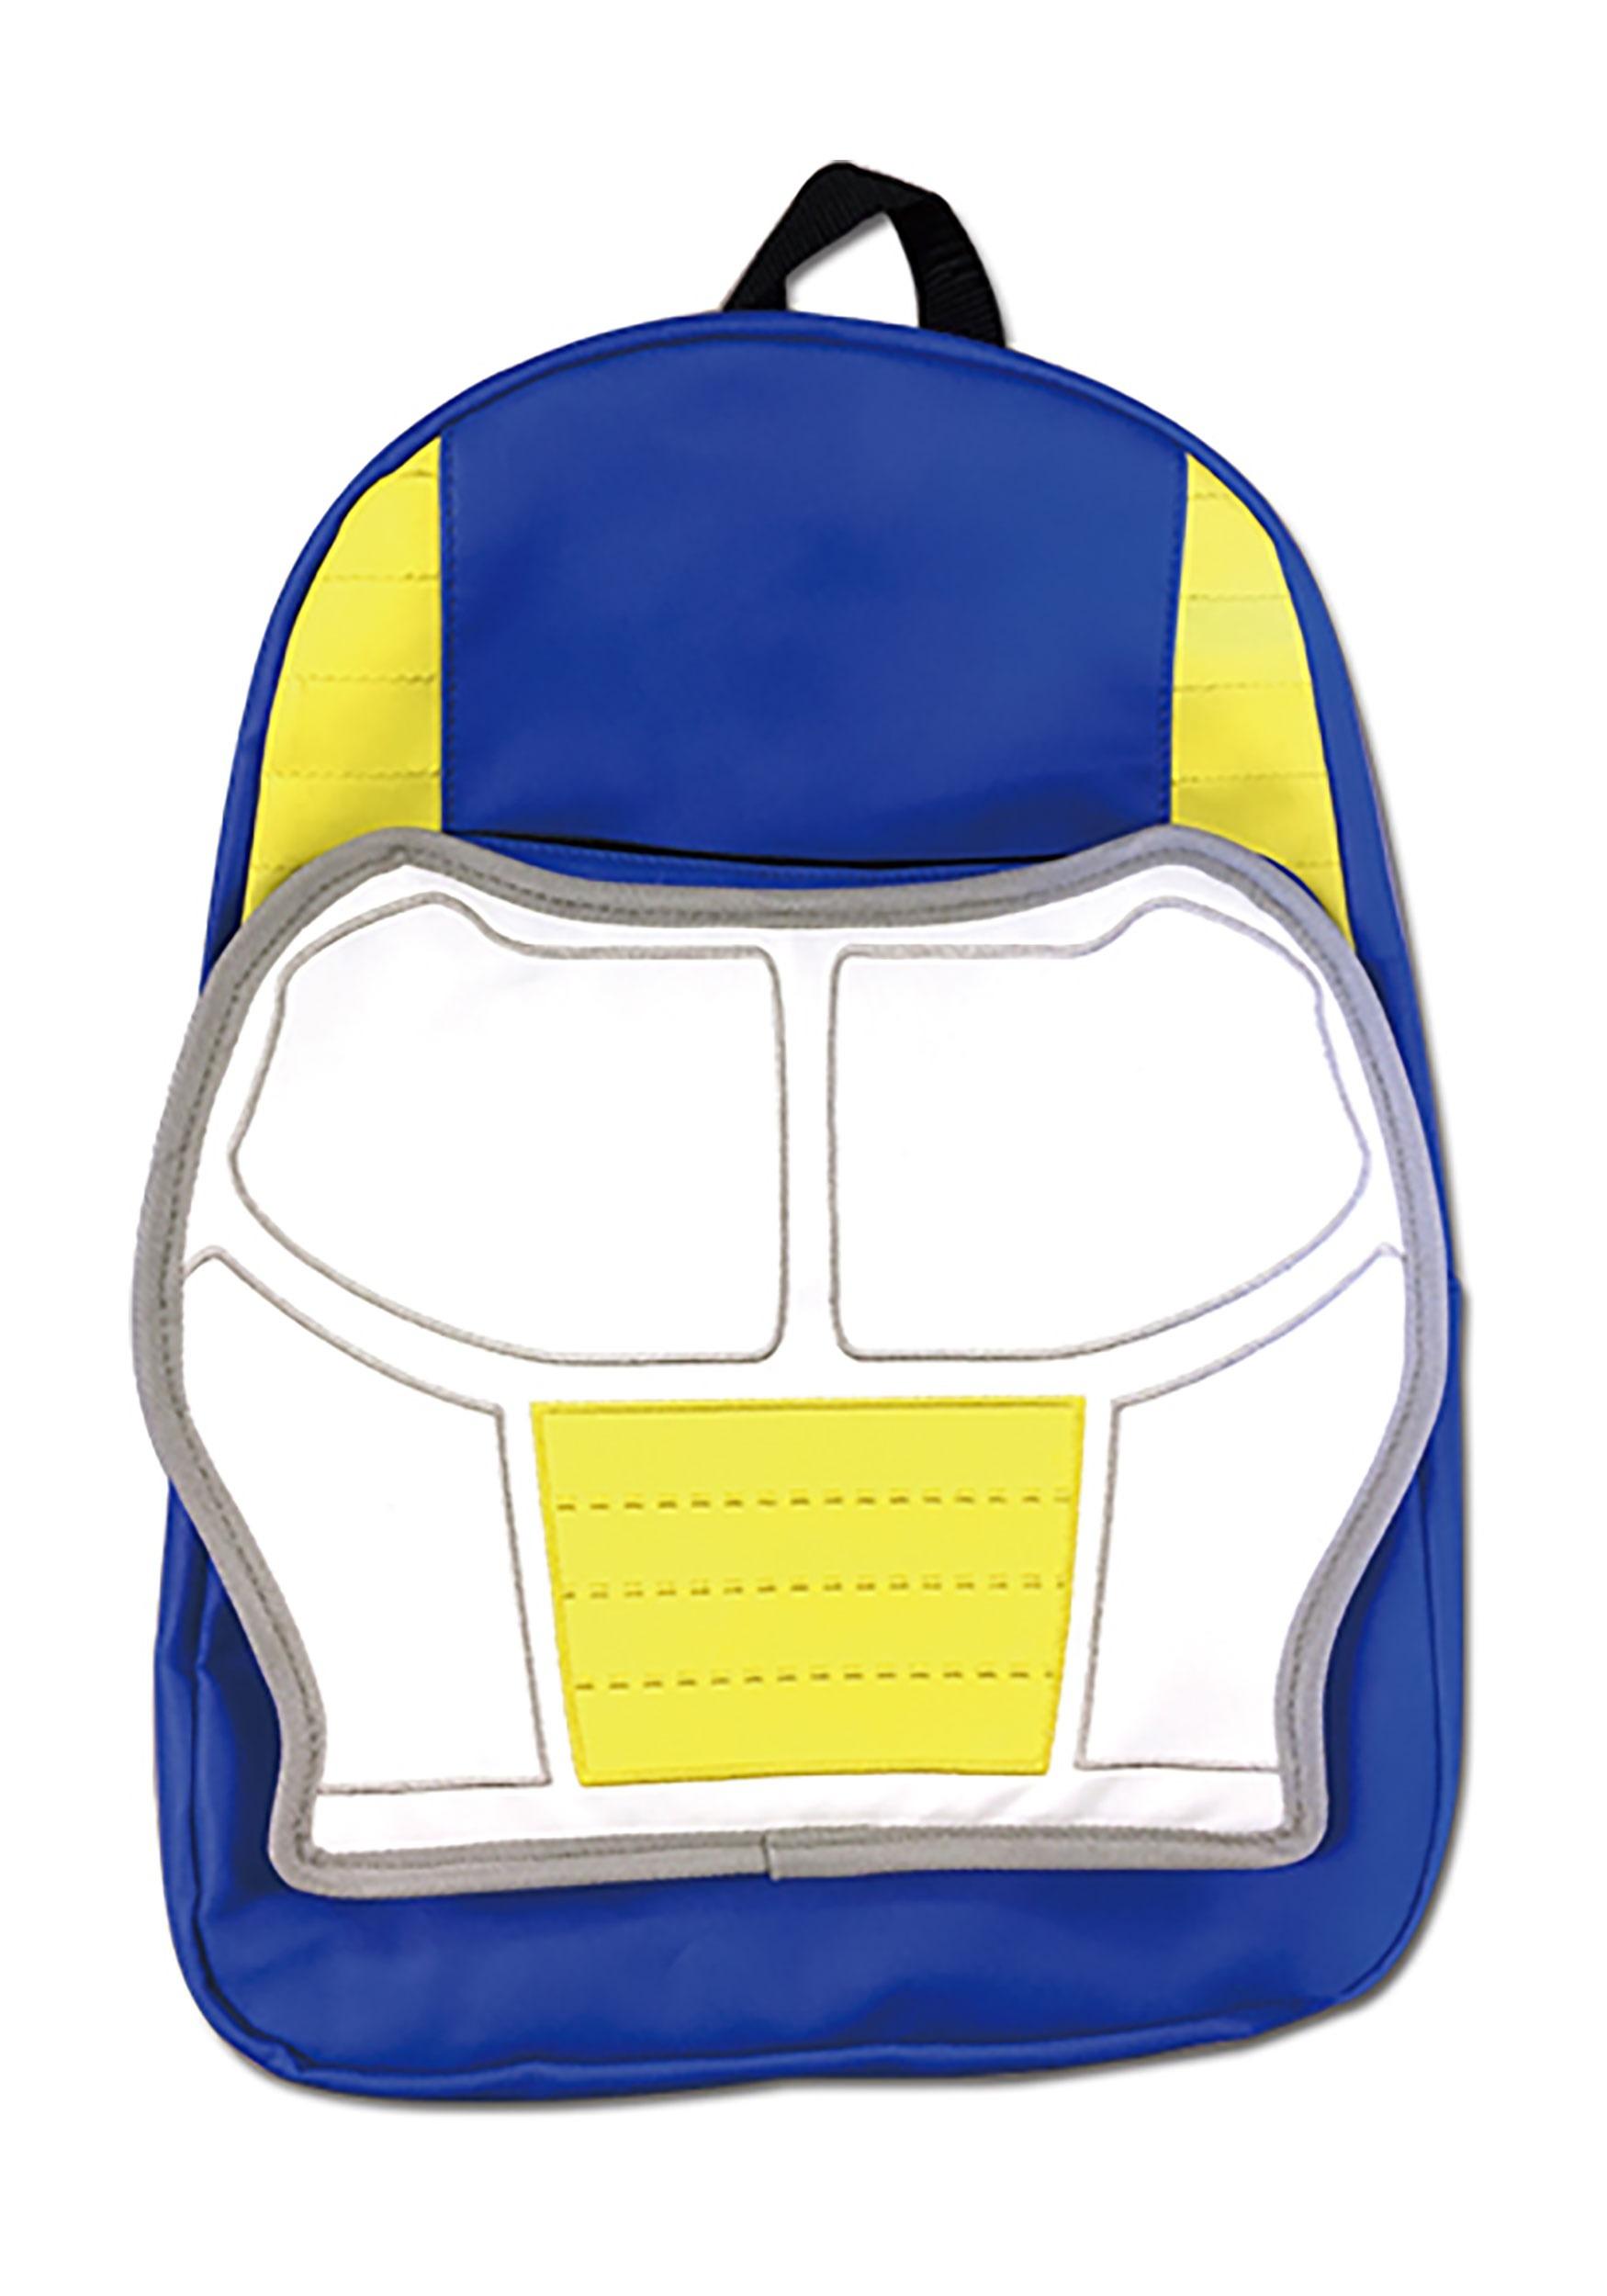 Goku Saiyan Dragon Ball Z Armor Backpack Too bad he blue up with the saiyan planet in a flash. dragon ball z goku saiyan armor backpack